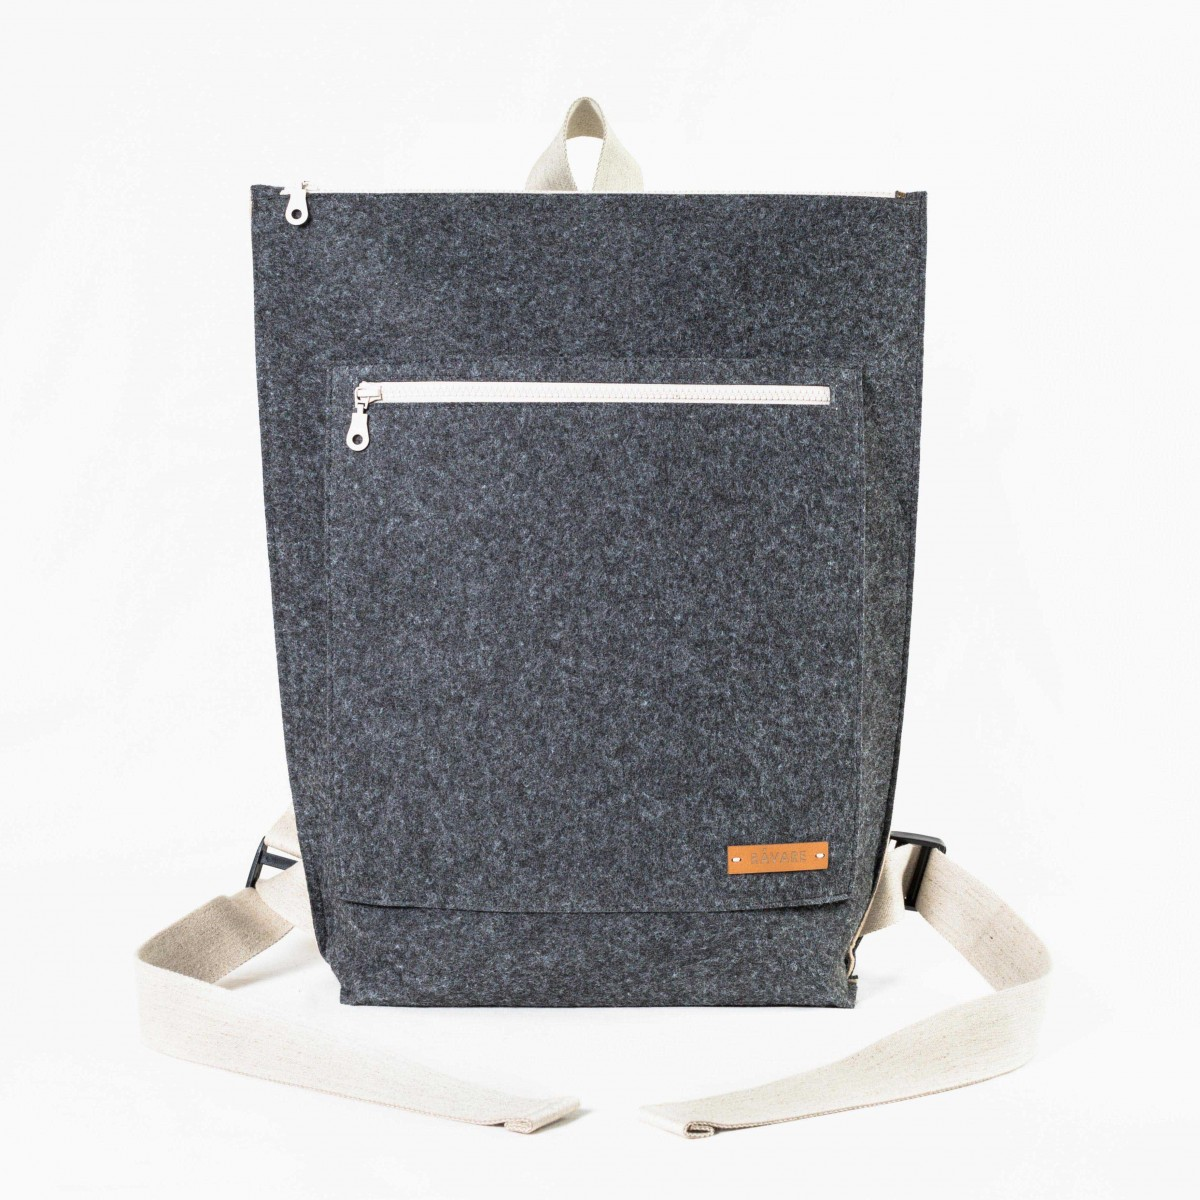 RÅVARE City-Rucksack aus Nadelfilz grau-beige [TAMO]